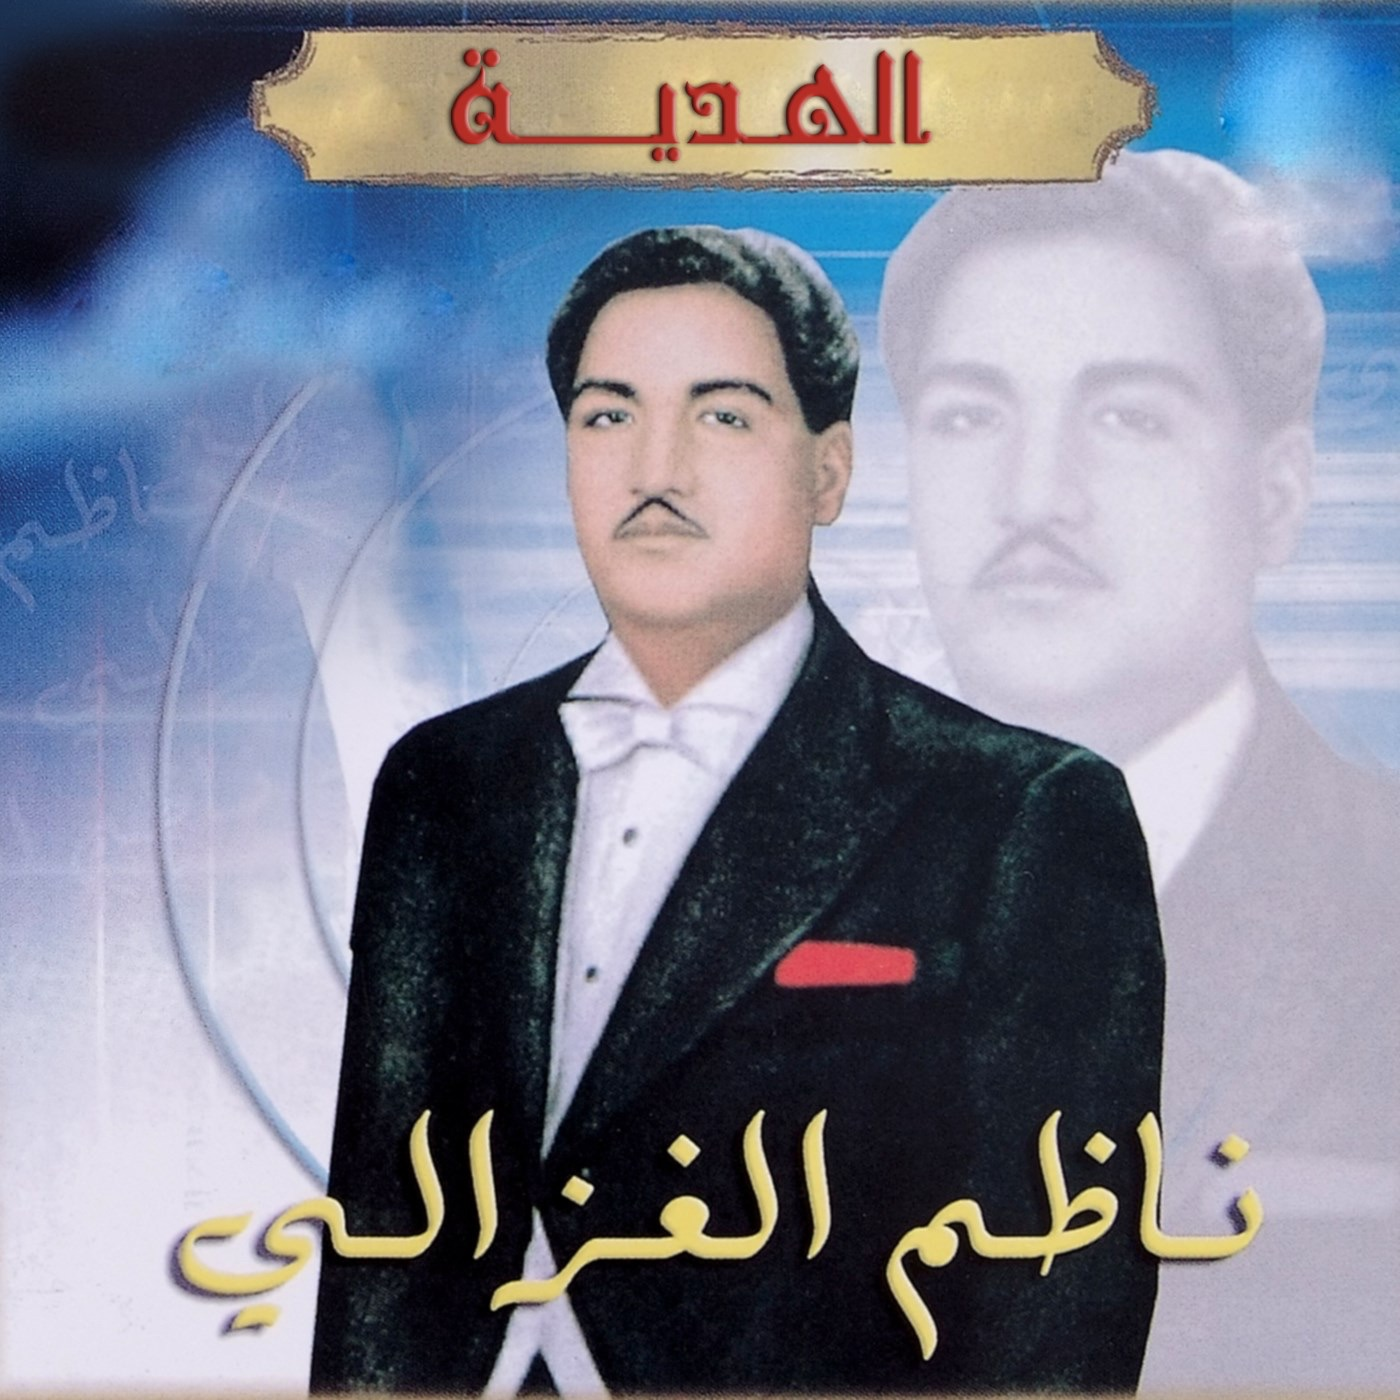 Tesbah Ala Khair